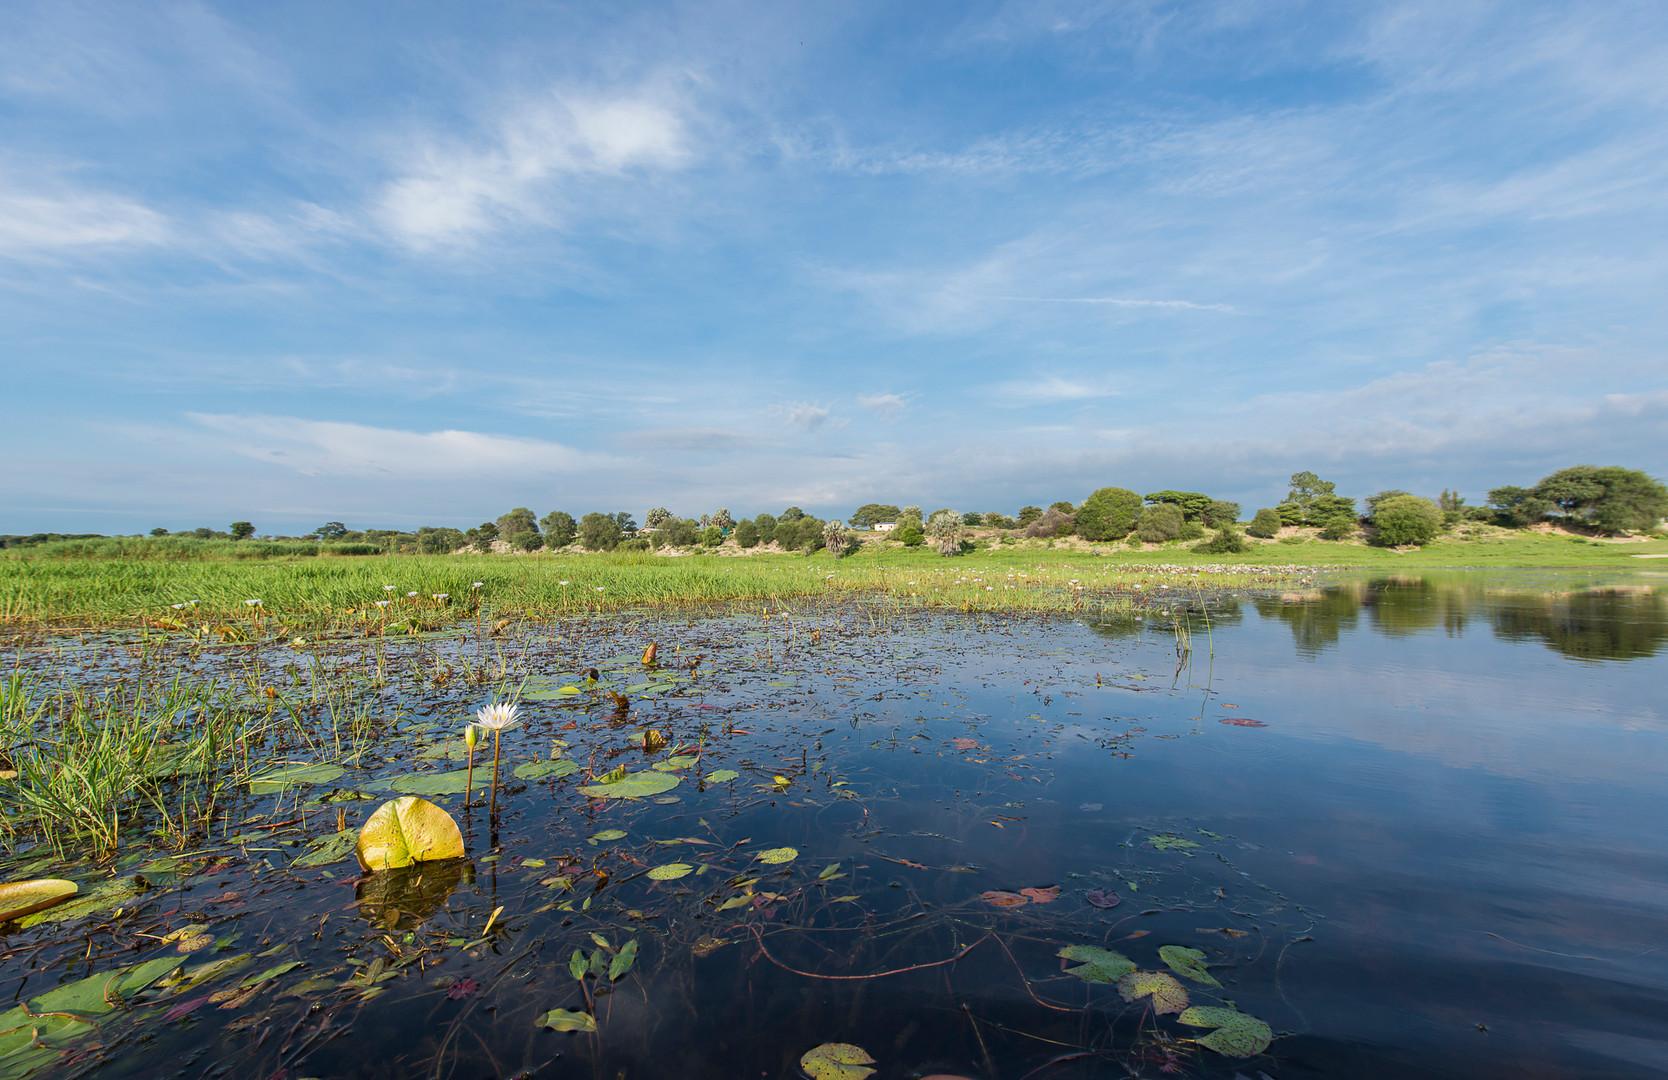 Boteti river Botswana